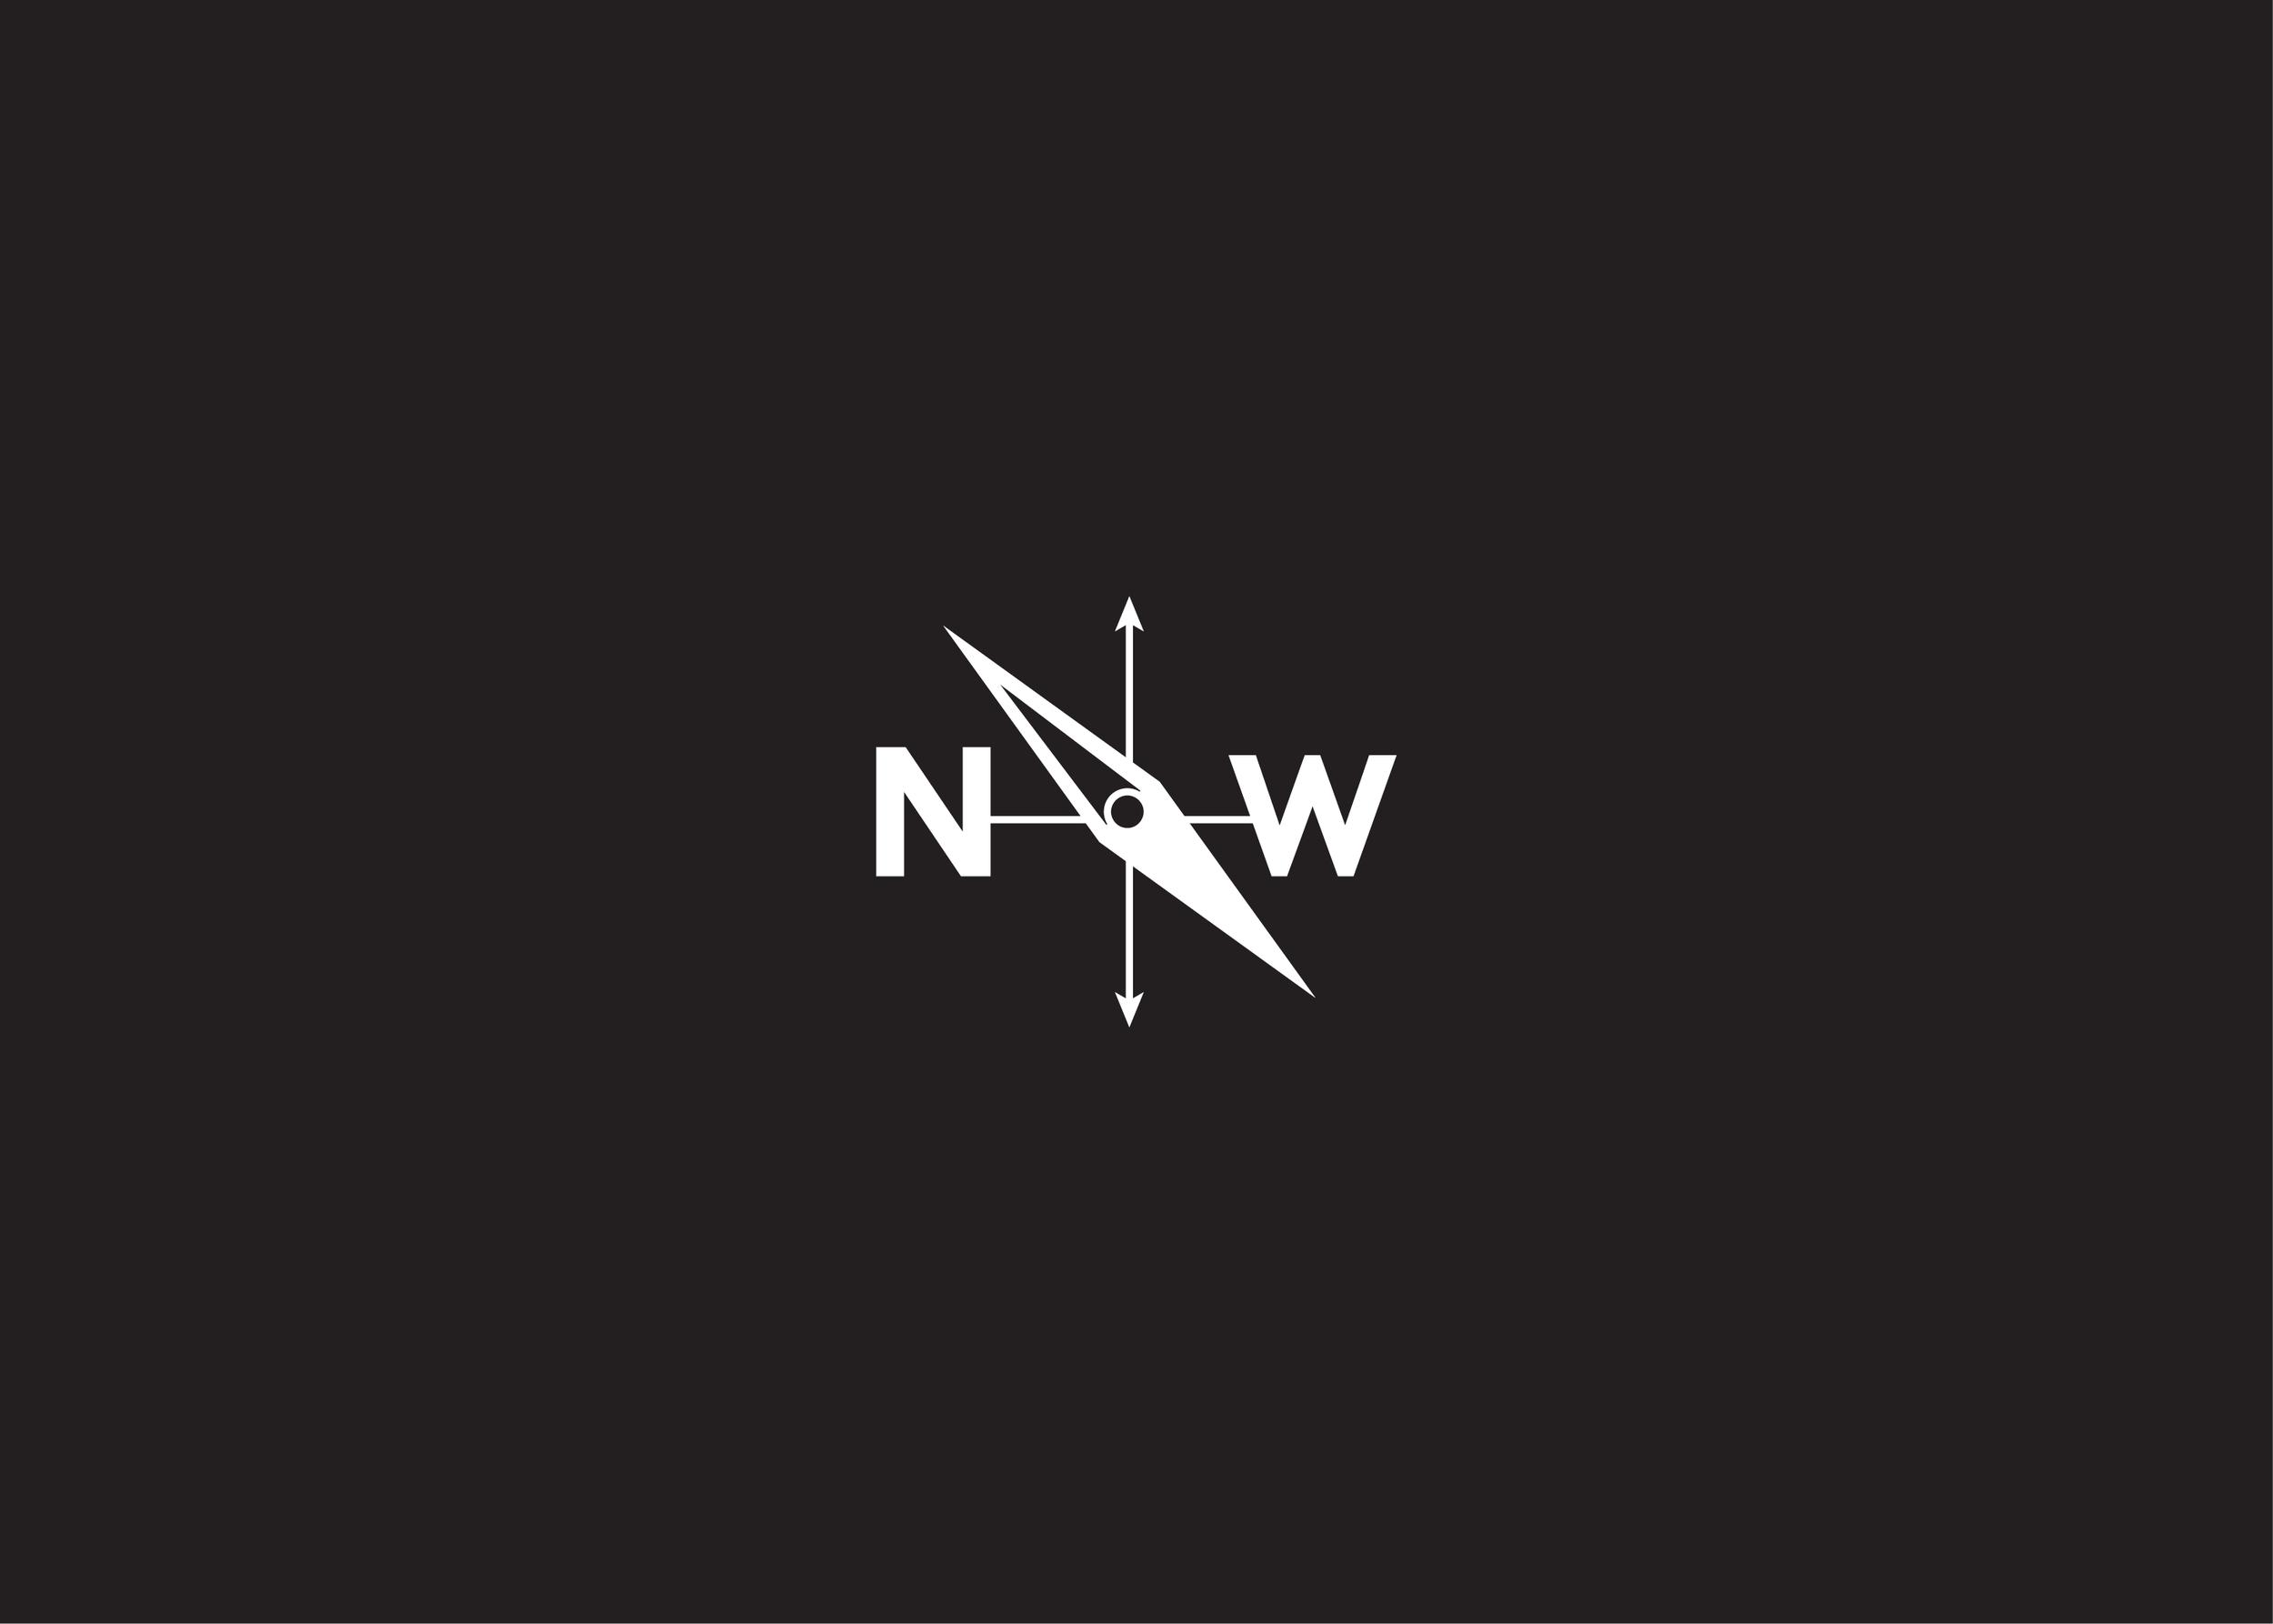 NWBW_Portfolio_Layout-01.png